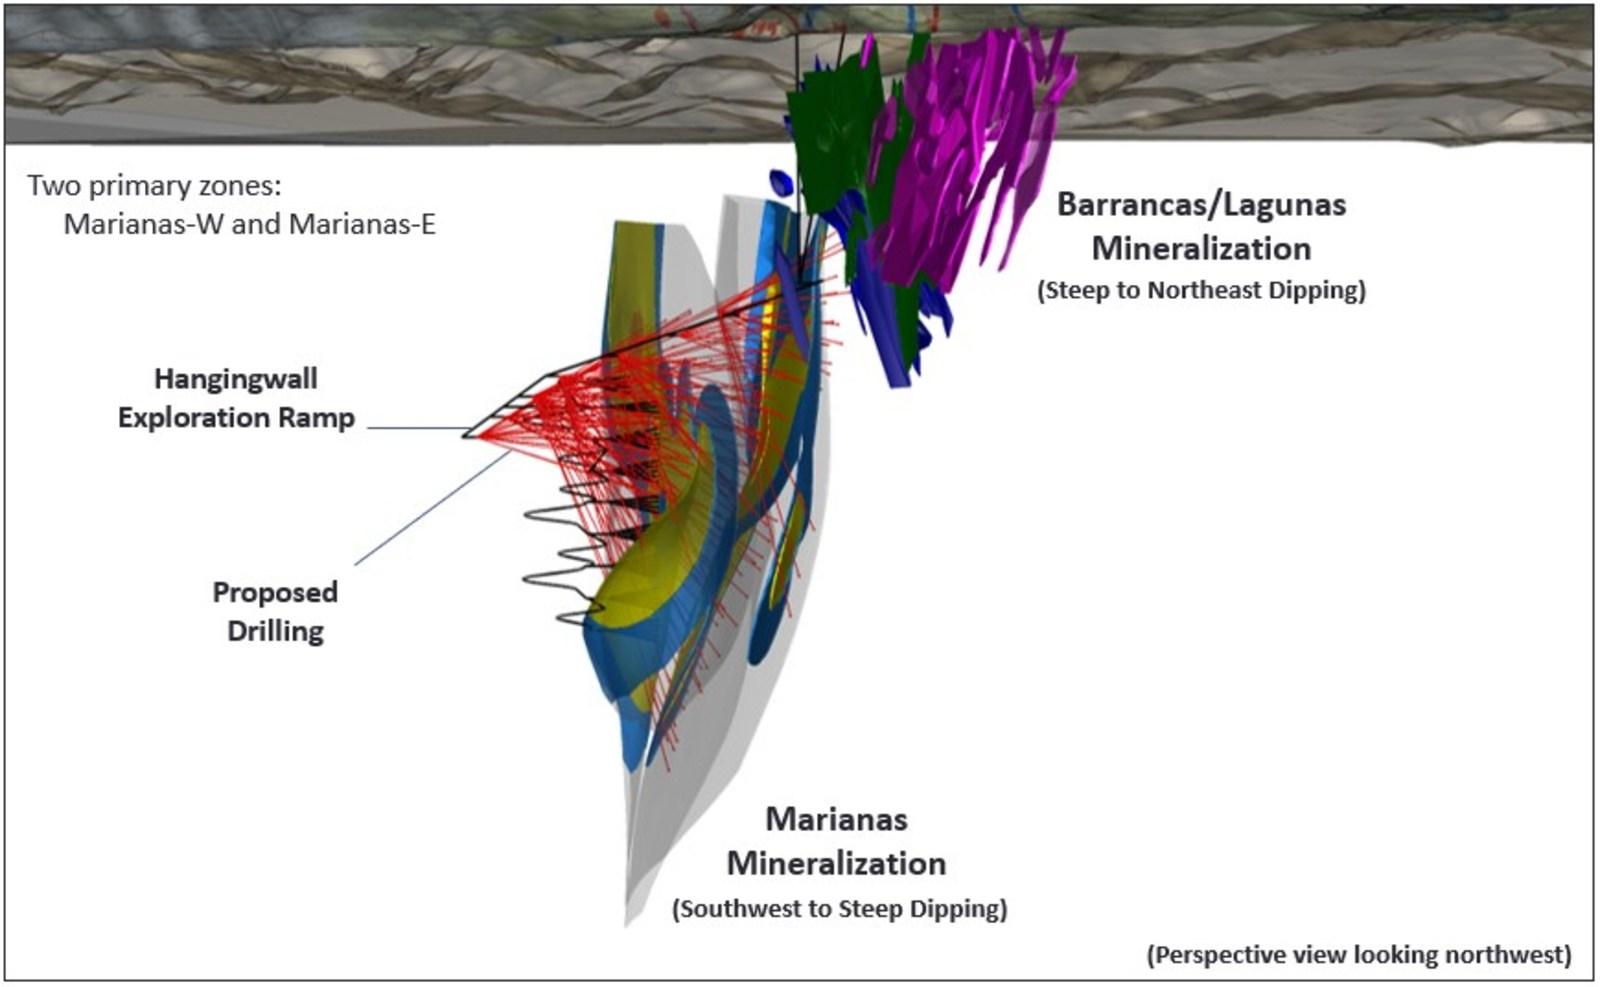 Figure 2 Marianas Zone decline and drill program